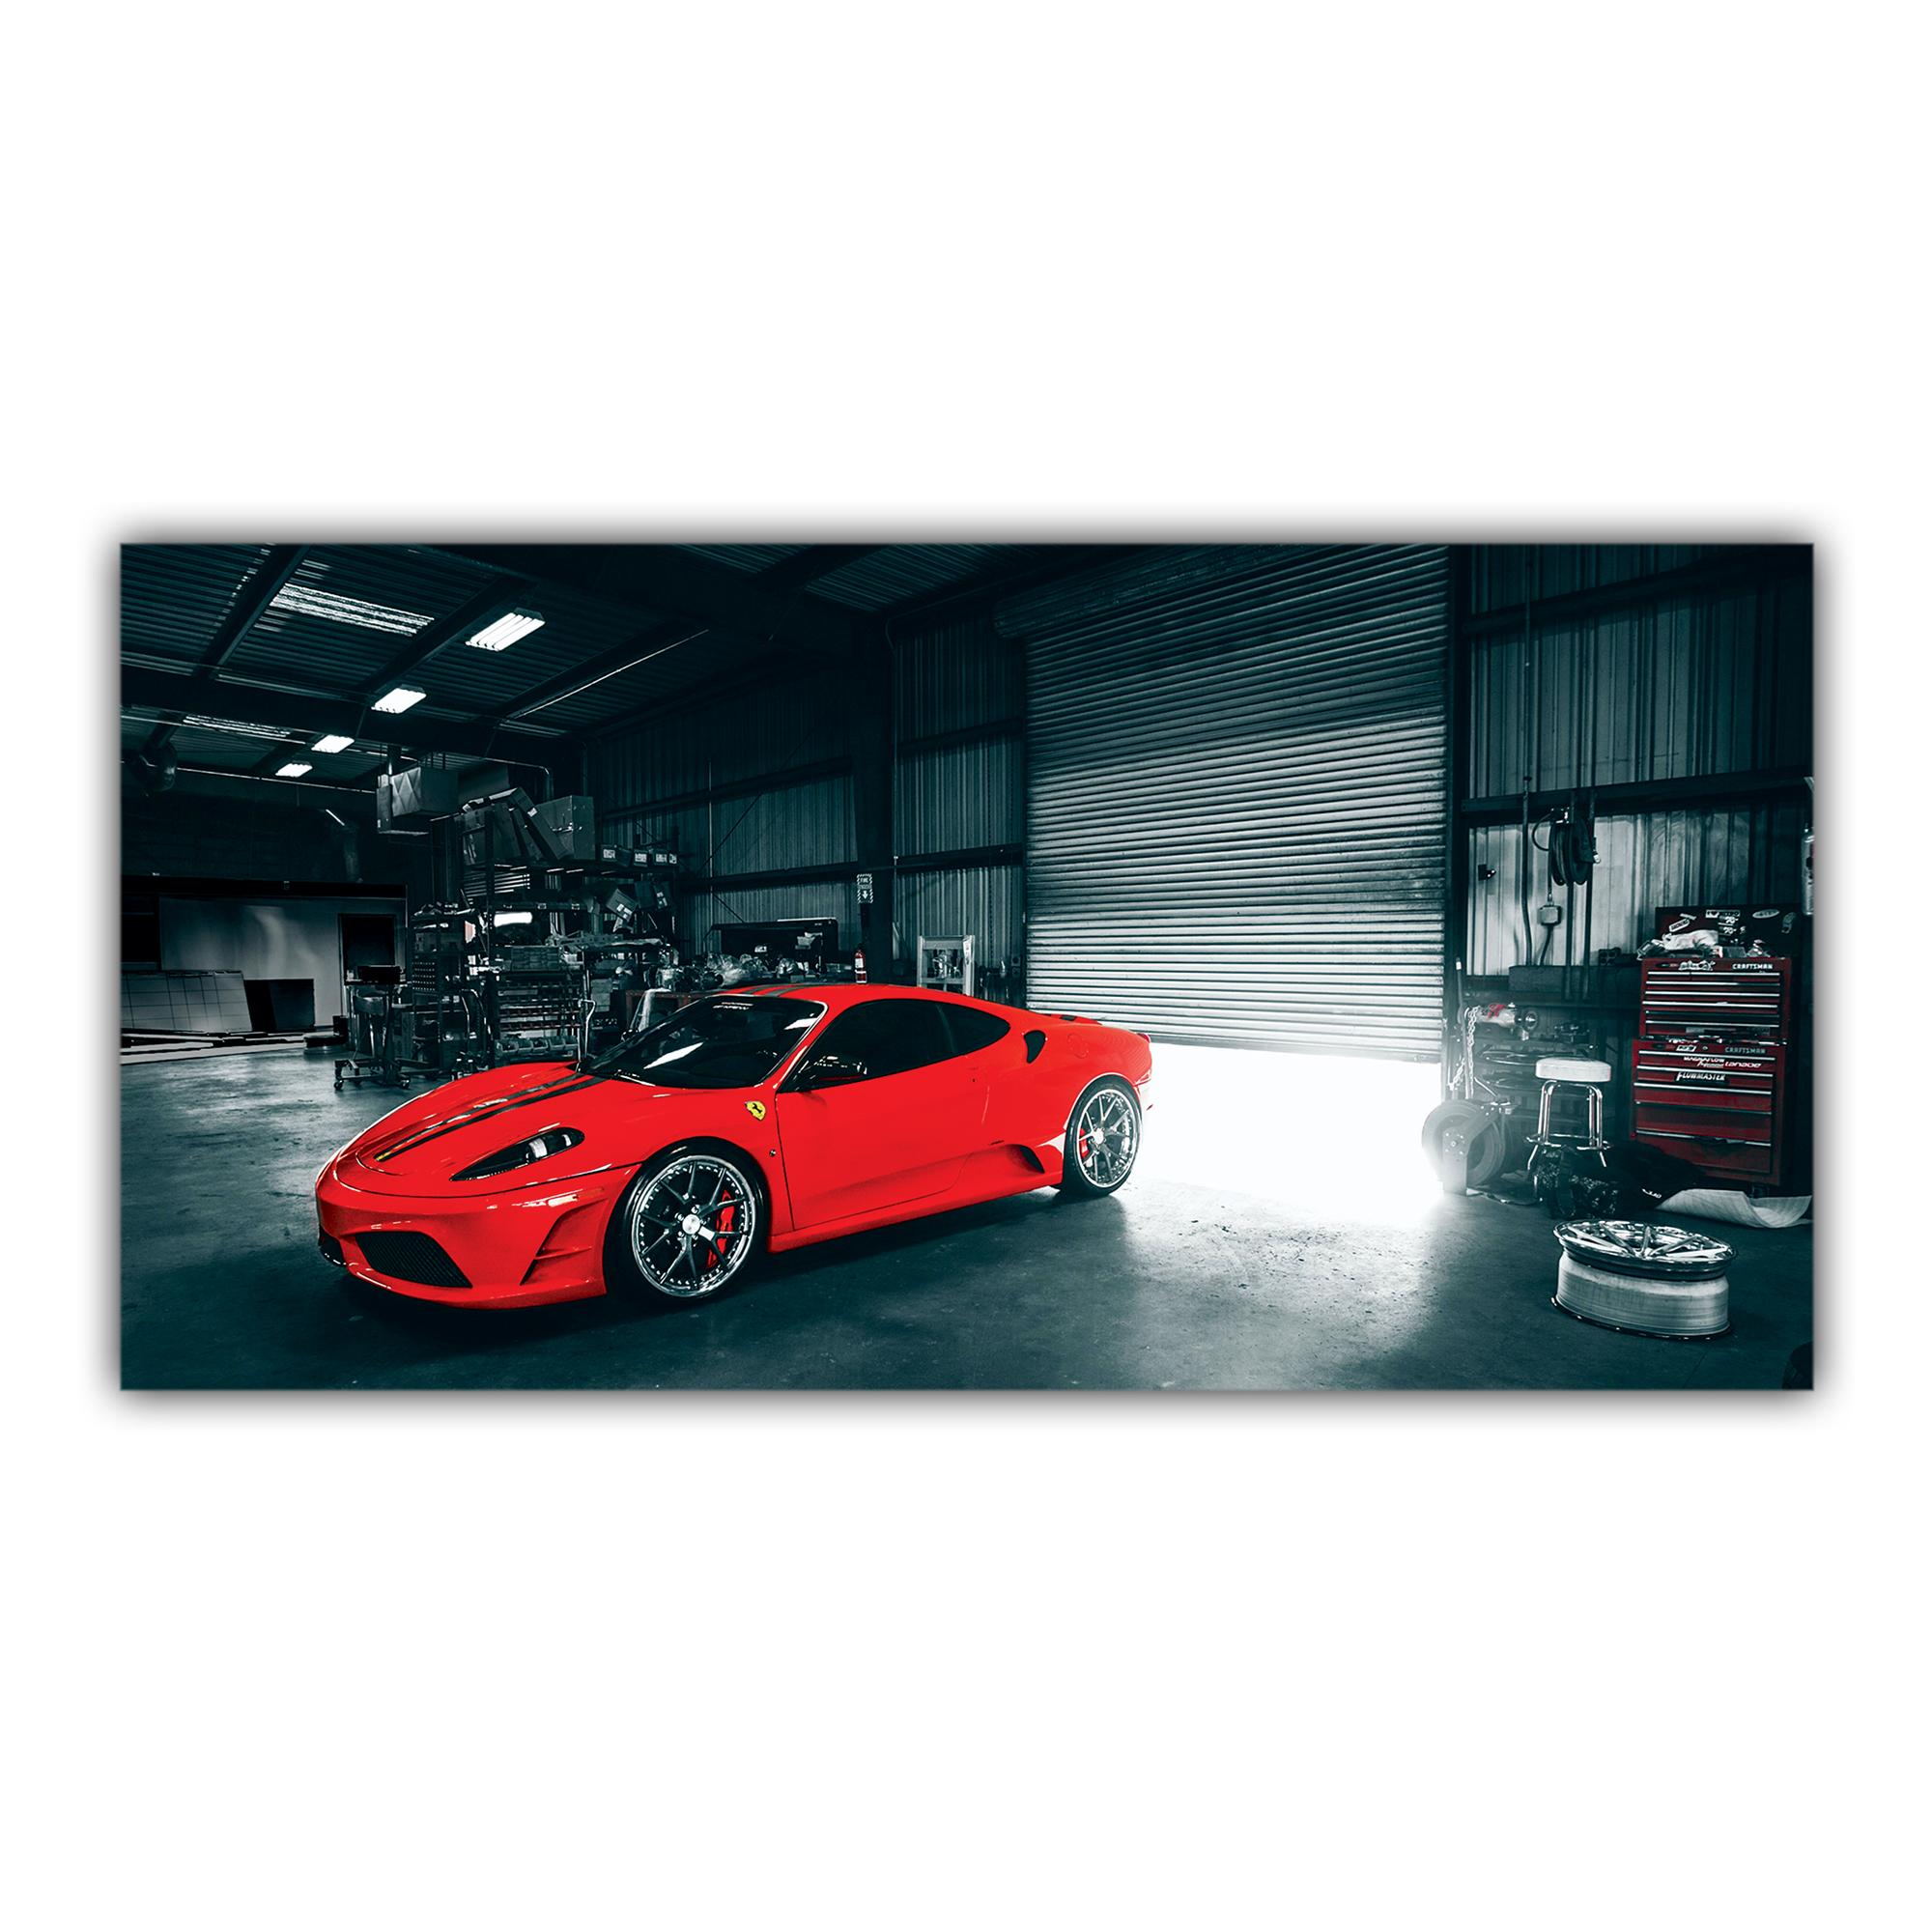 Ferrari F430 Scuderia Sport Italienne Rouge Voiture